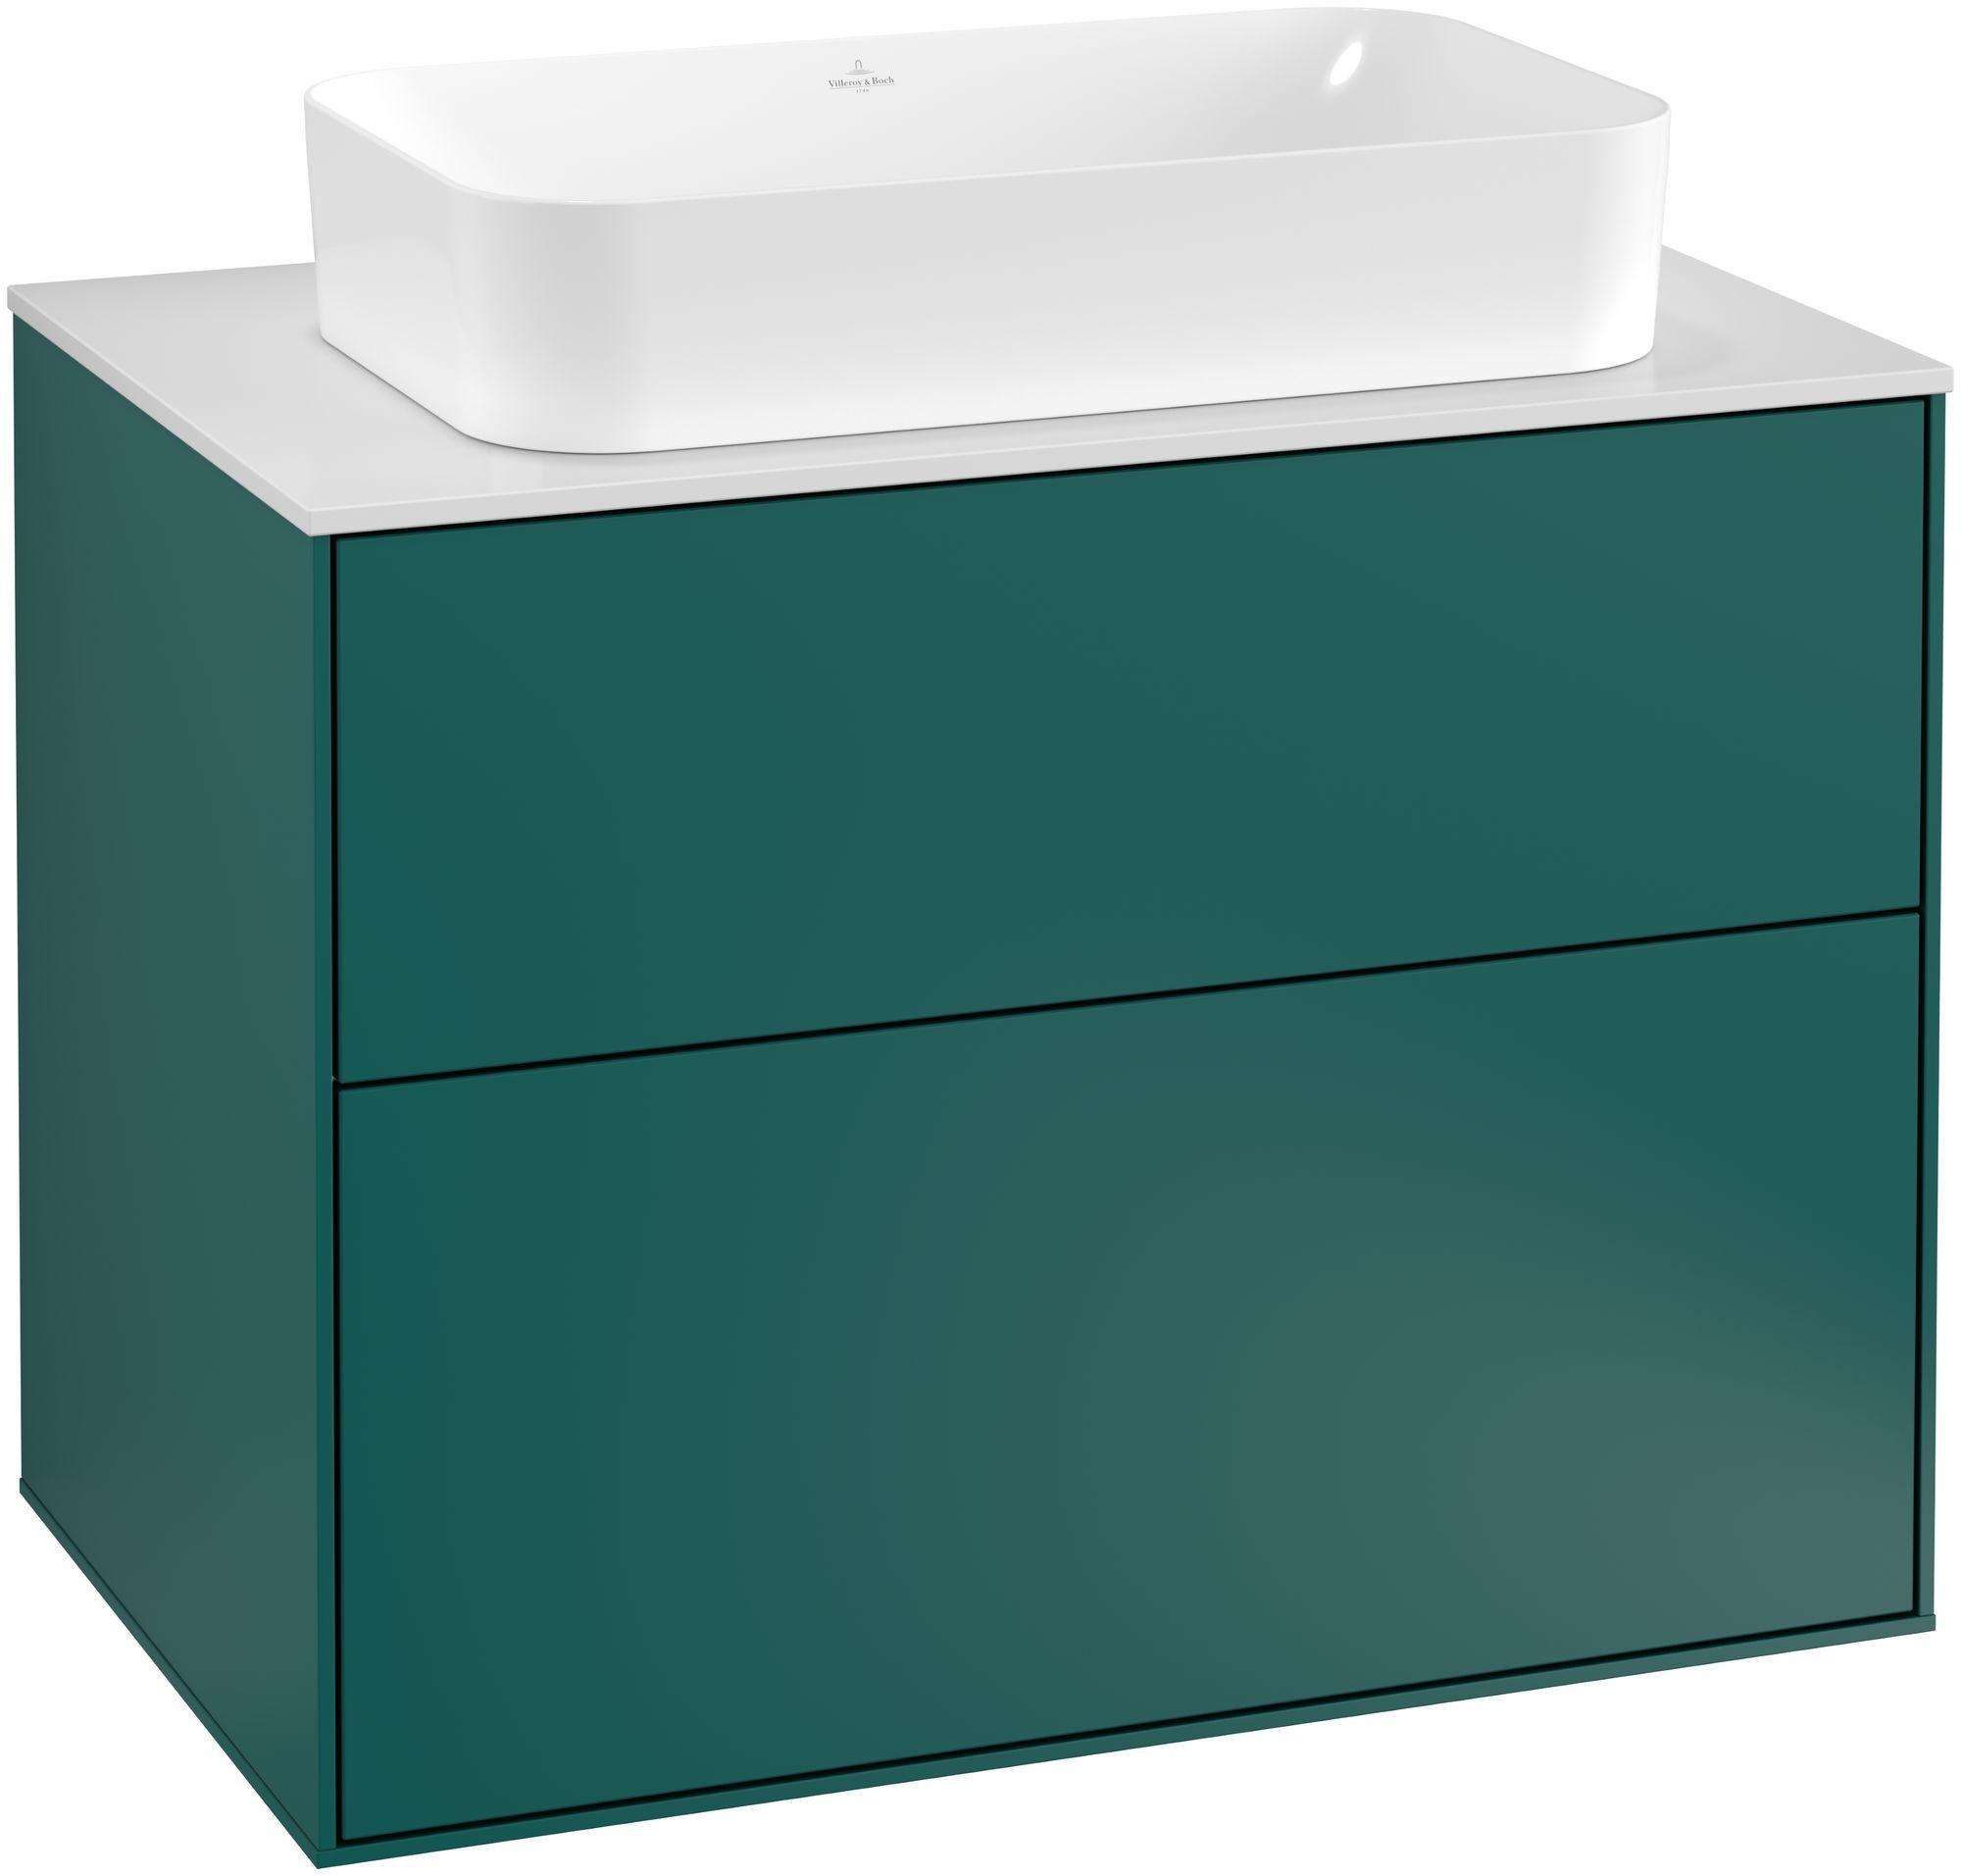 Villeroy & Boch Finion F22 Waschtischunterschrank 2 Auszüge B:80xH:60,3xT:50,1cm Front, Korpus: Cedar, Glasplatte: White Matt F22100GS